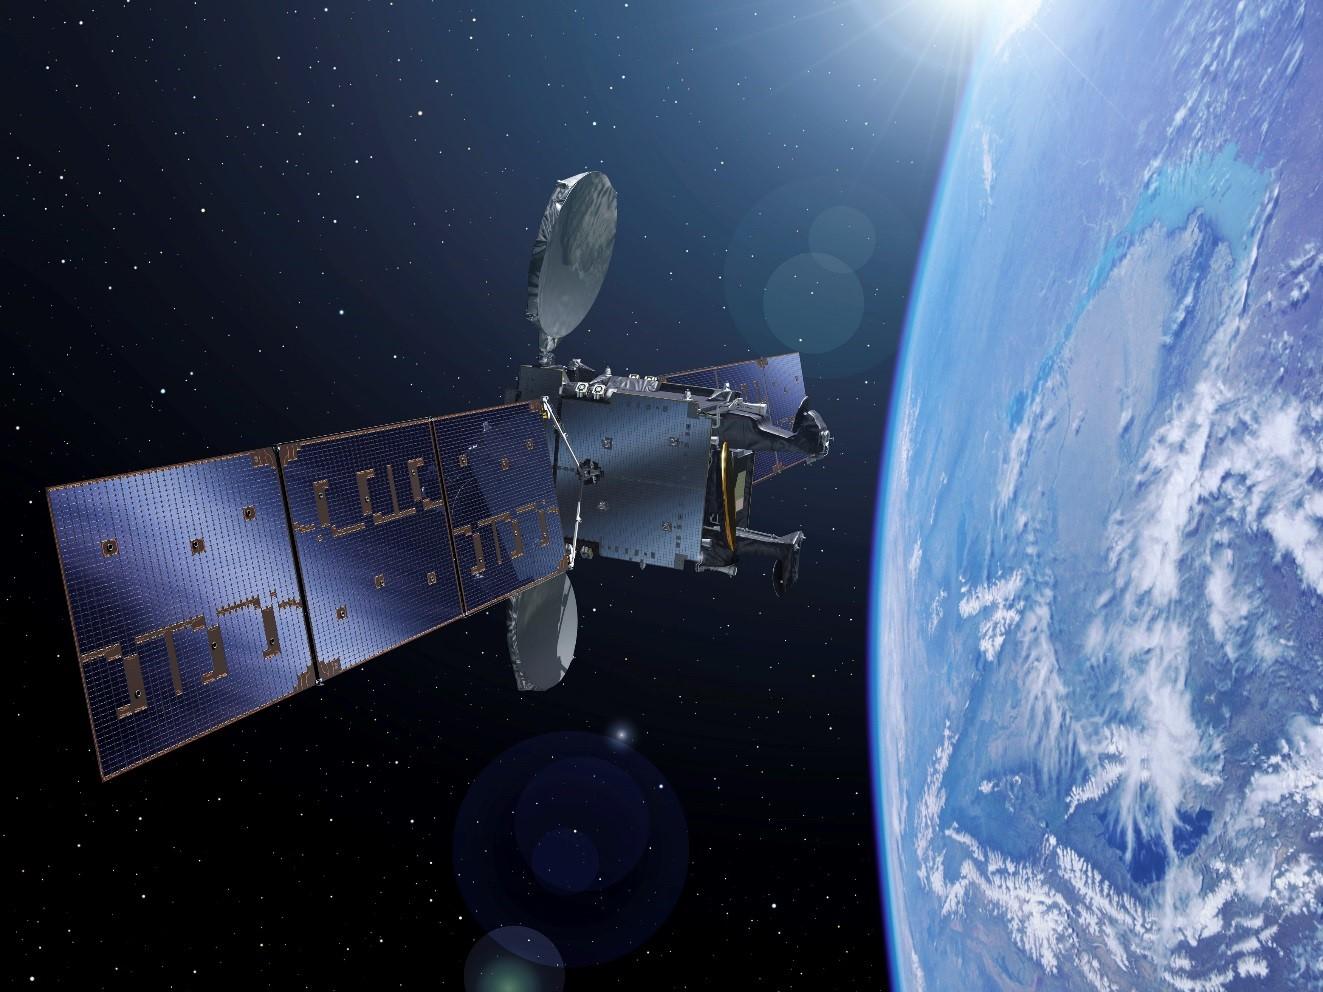 vs16-hispasat-satellite-img